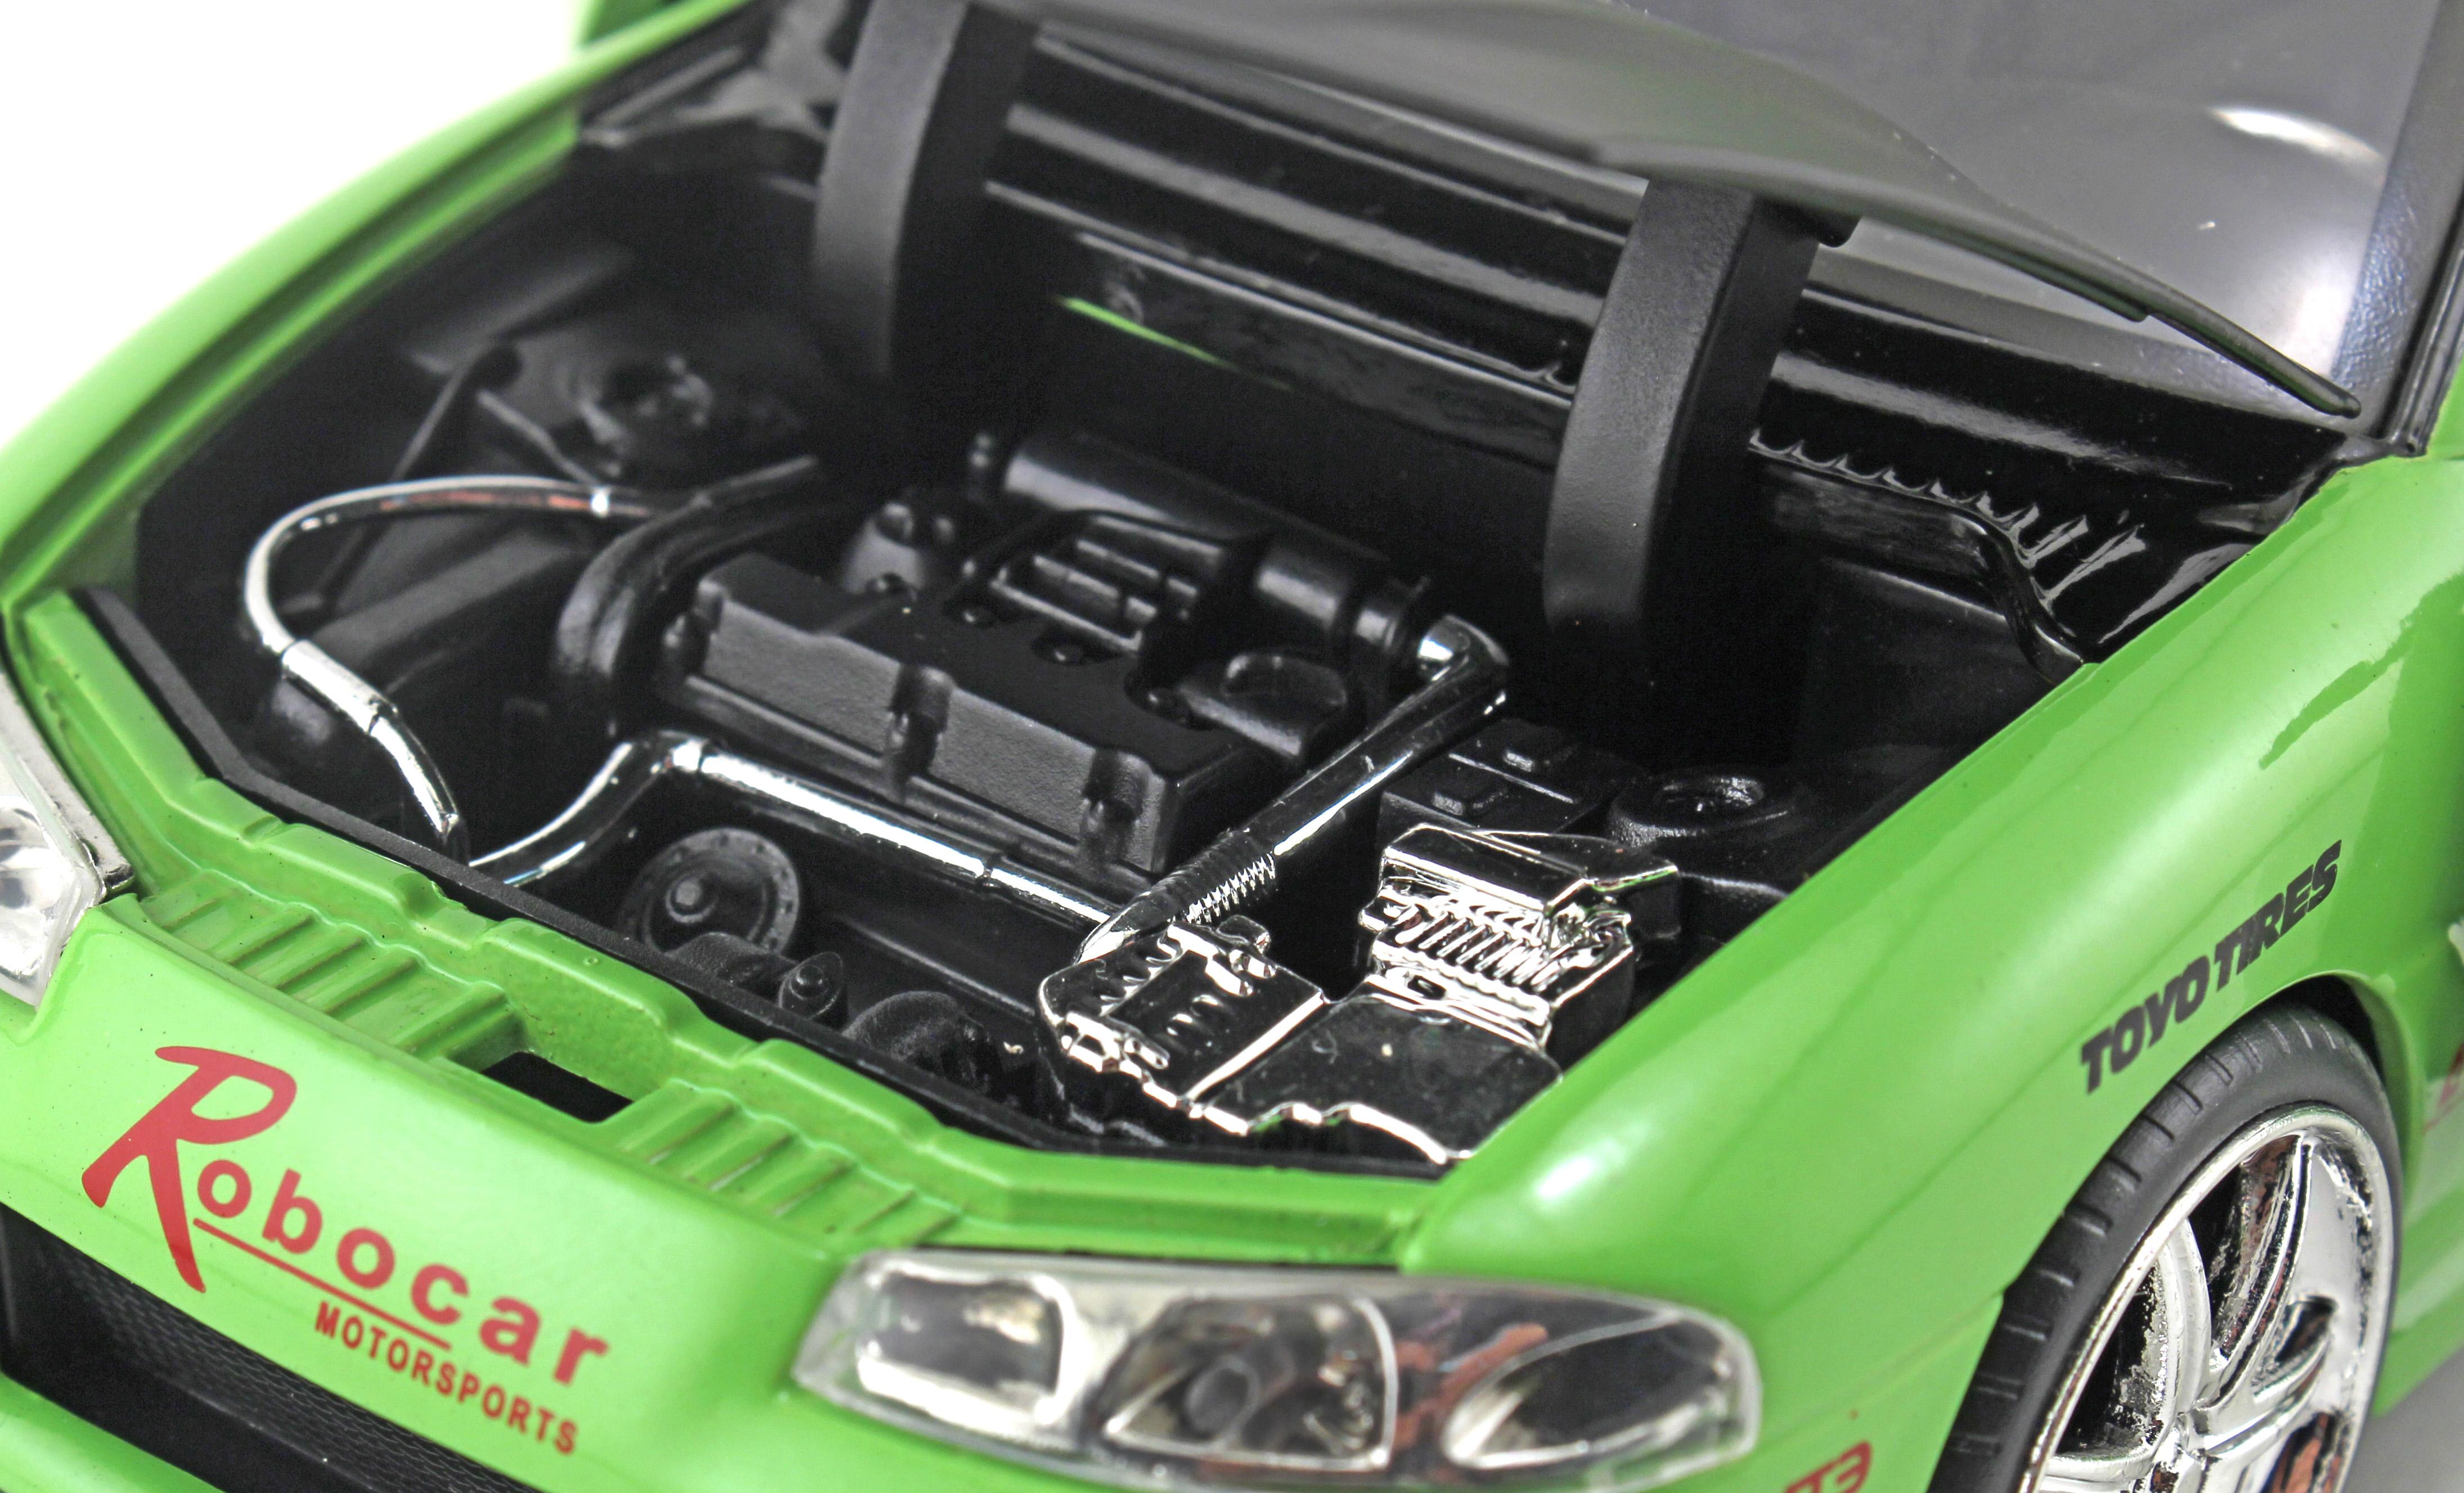 JADA 1:24 Fast Furious 8 Mitsubishi Eclipse Metal Diecast Model Car Toy Green